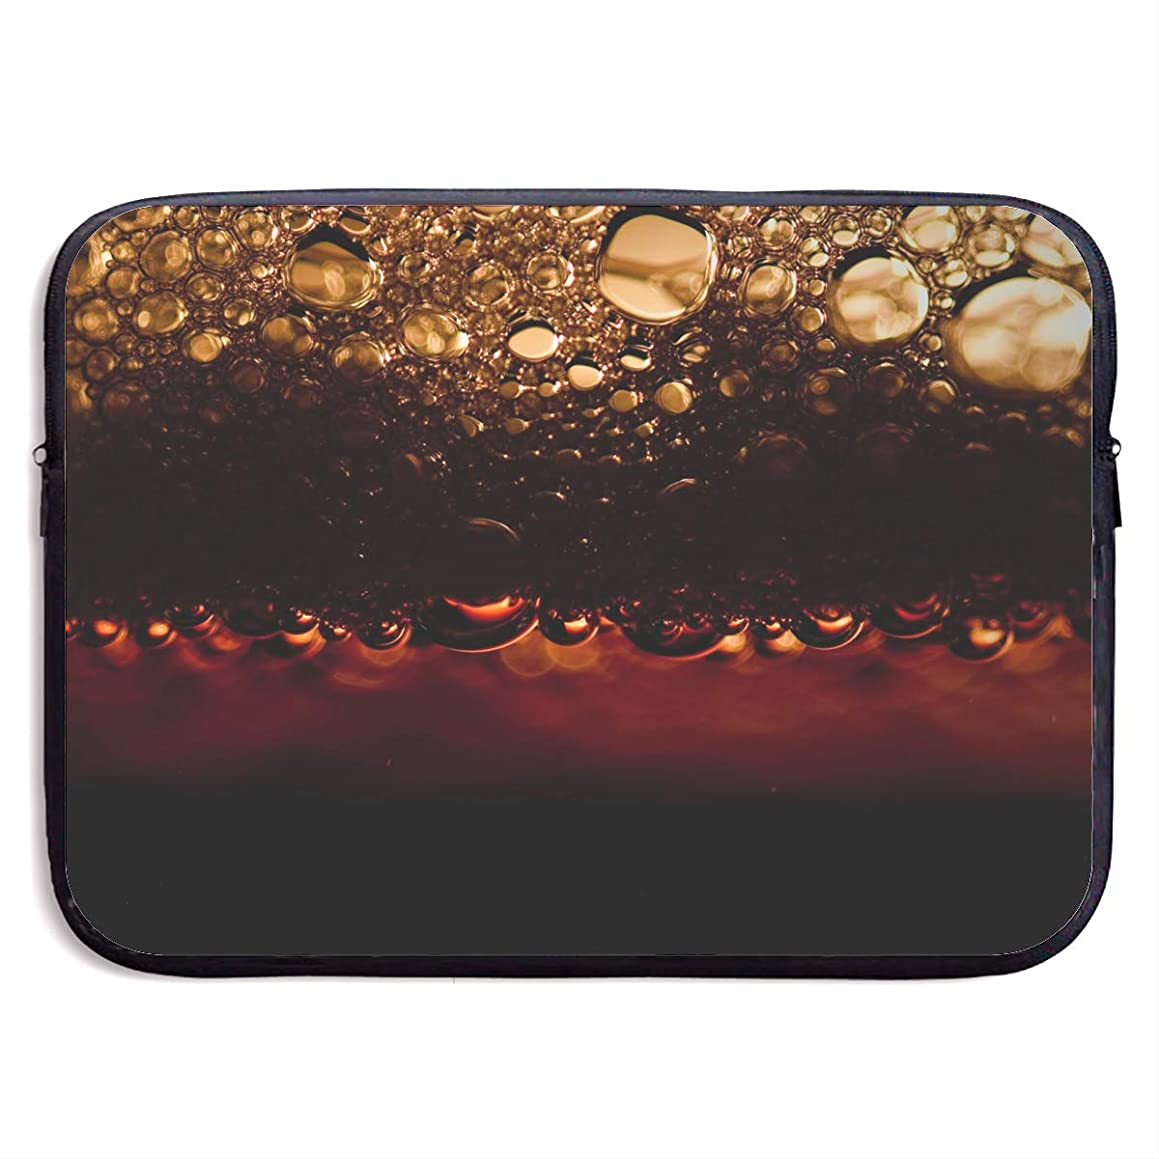 Laptop Sleeve Bag Beer Bubbles Handbag Case Computer Bag Zipper Notebook Cover